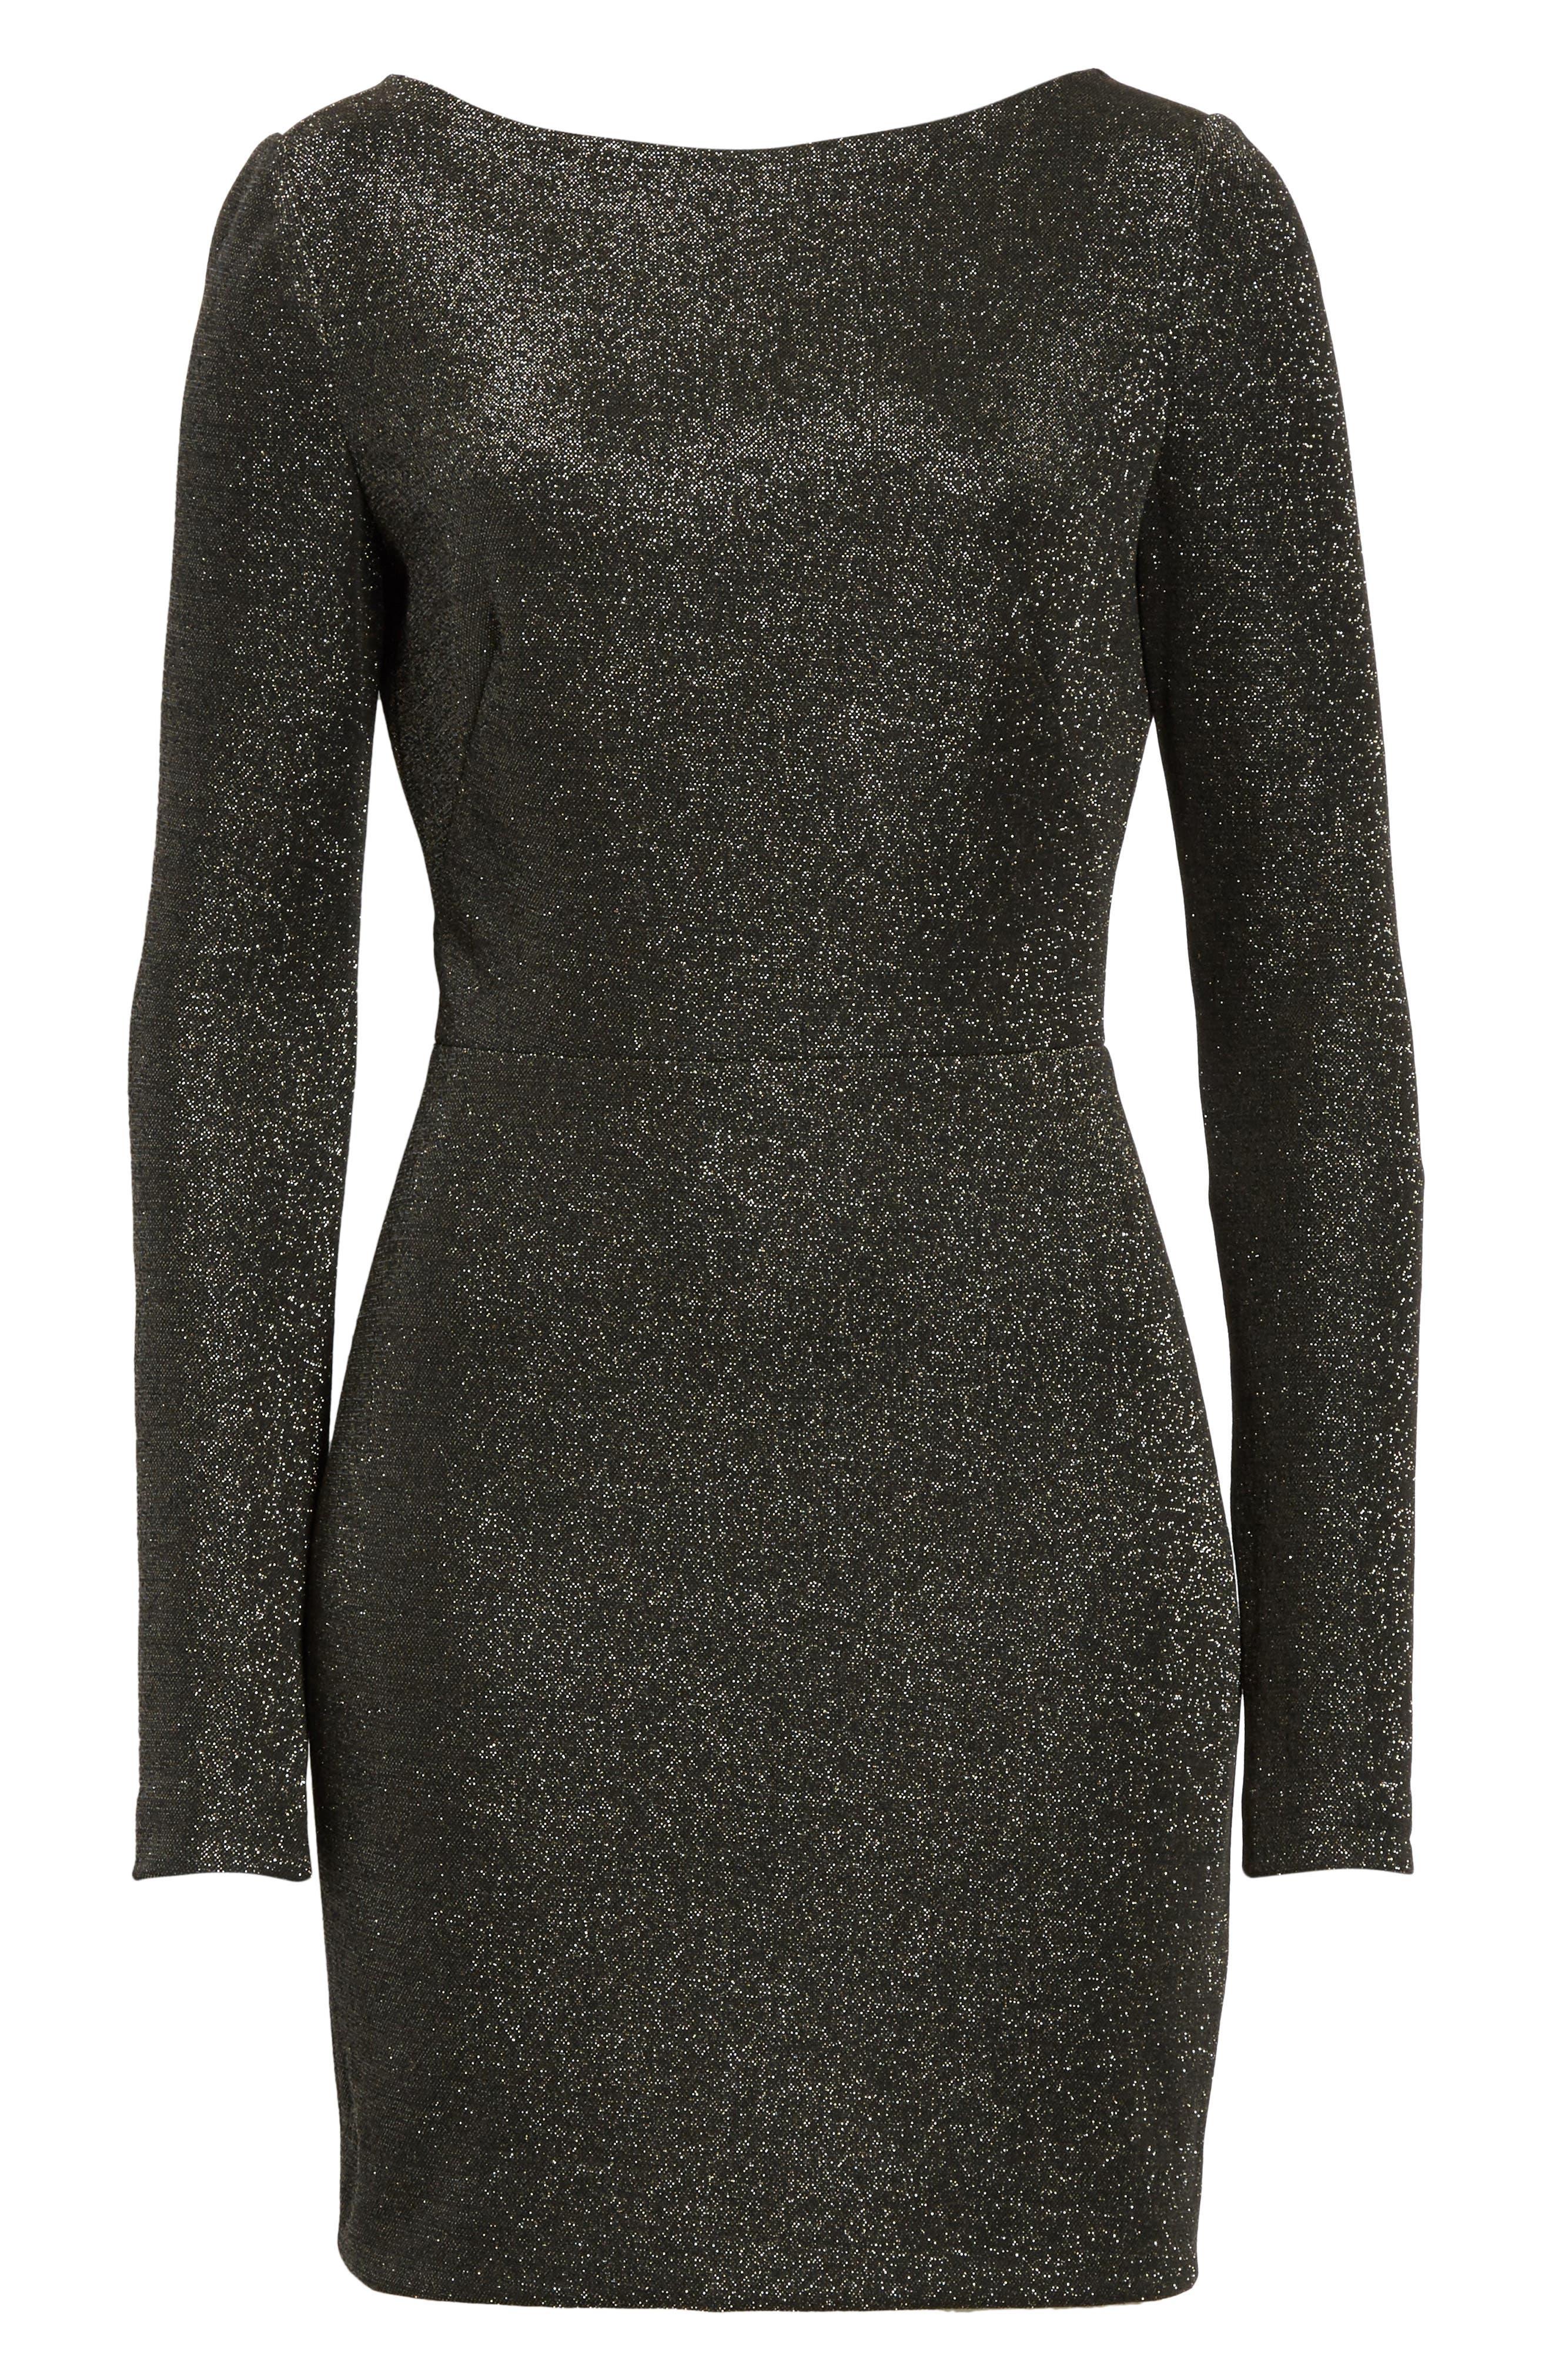 Diane von Furstenberg Sparkle Sheath Minidress,                             Alternate thumbnail 6, color,                             001